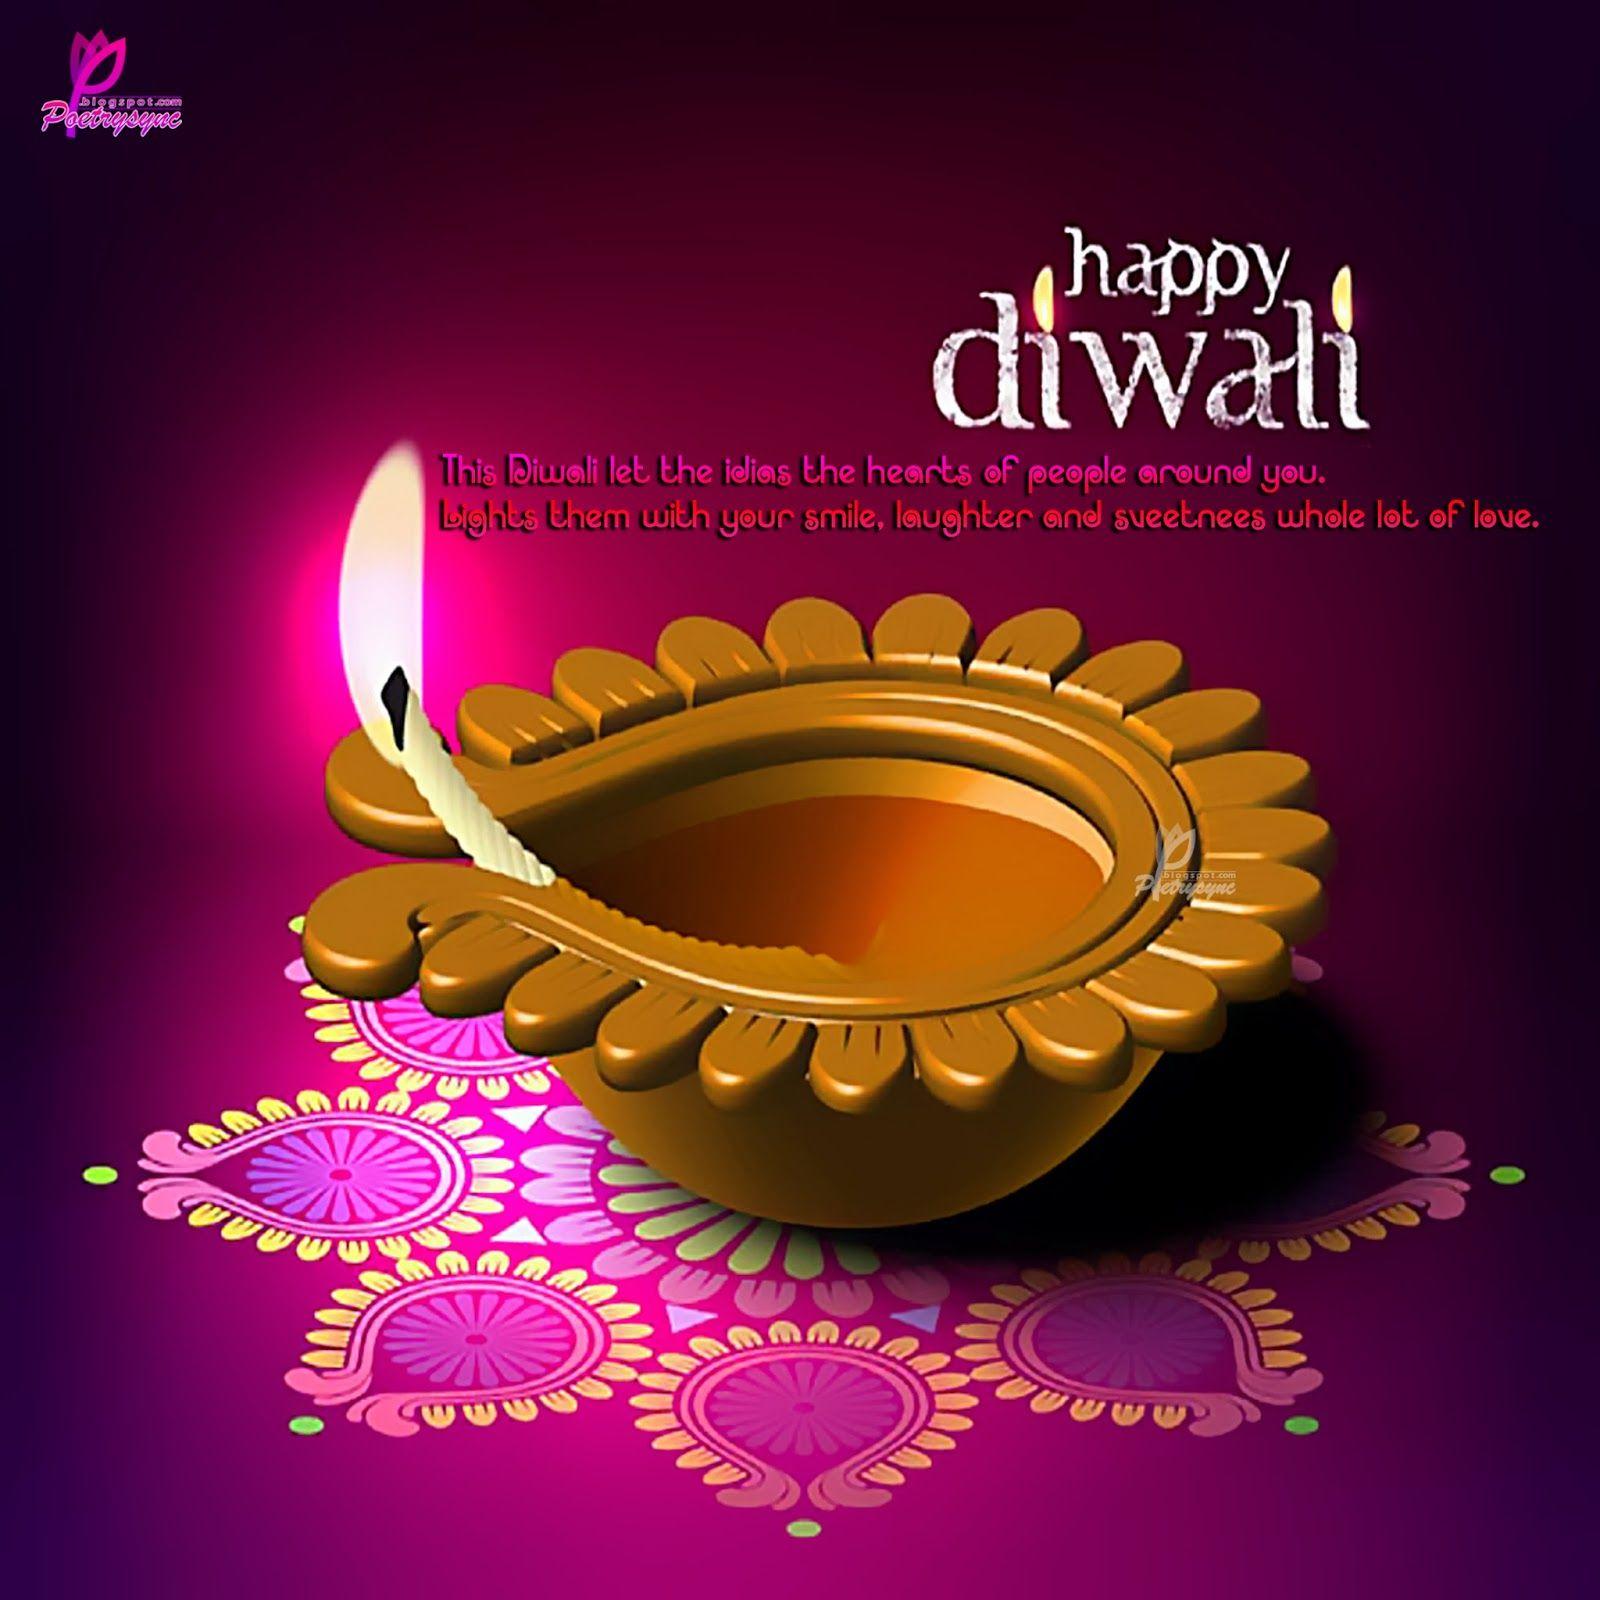 Diwali Greetings Cards And Quoetsg 16001600 Pixels Food